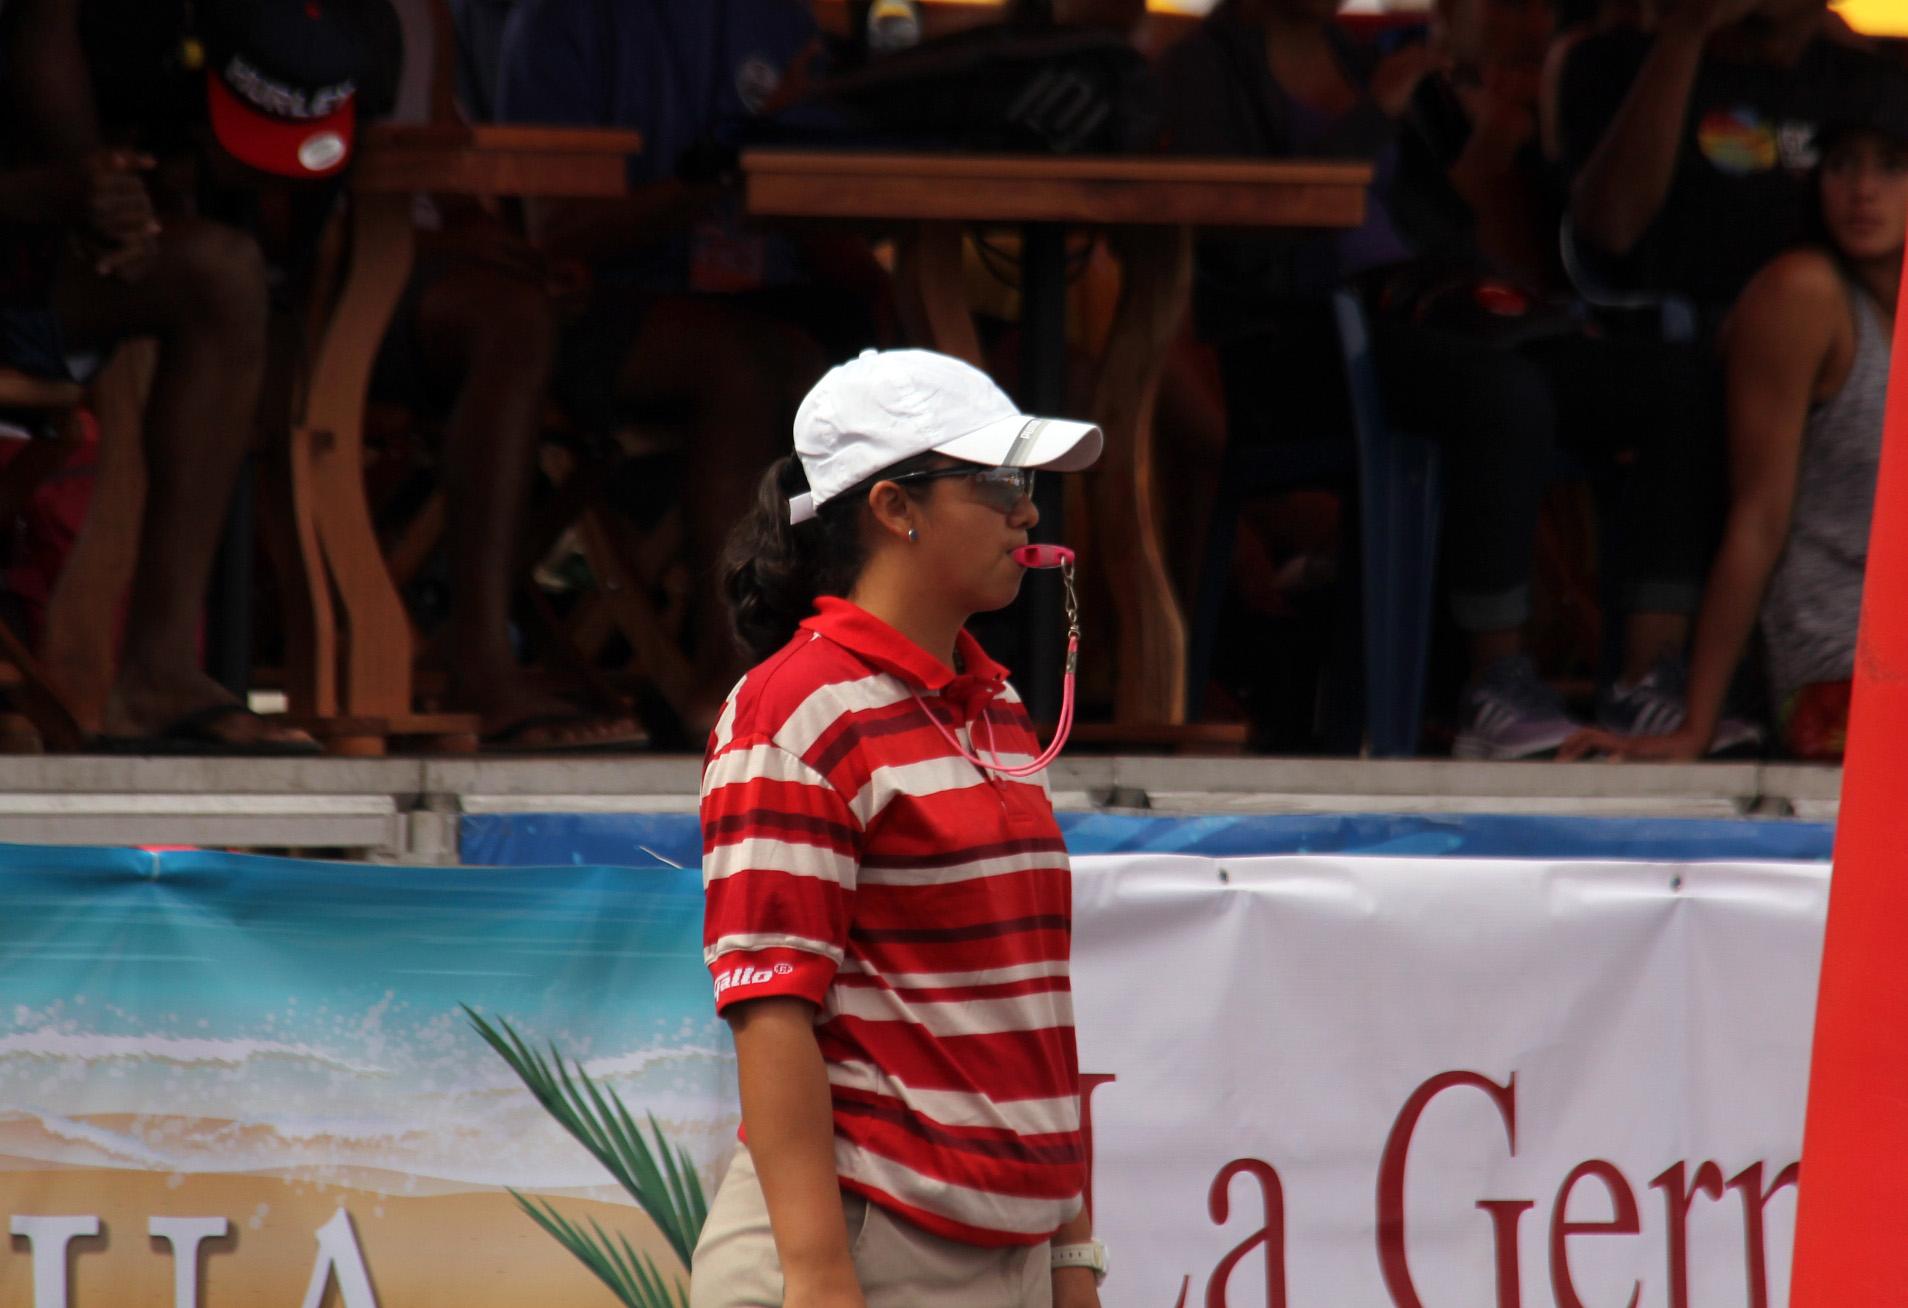 jornada-1-tour-norceca-guatemala-2016_25408663900_o